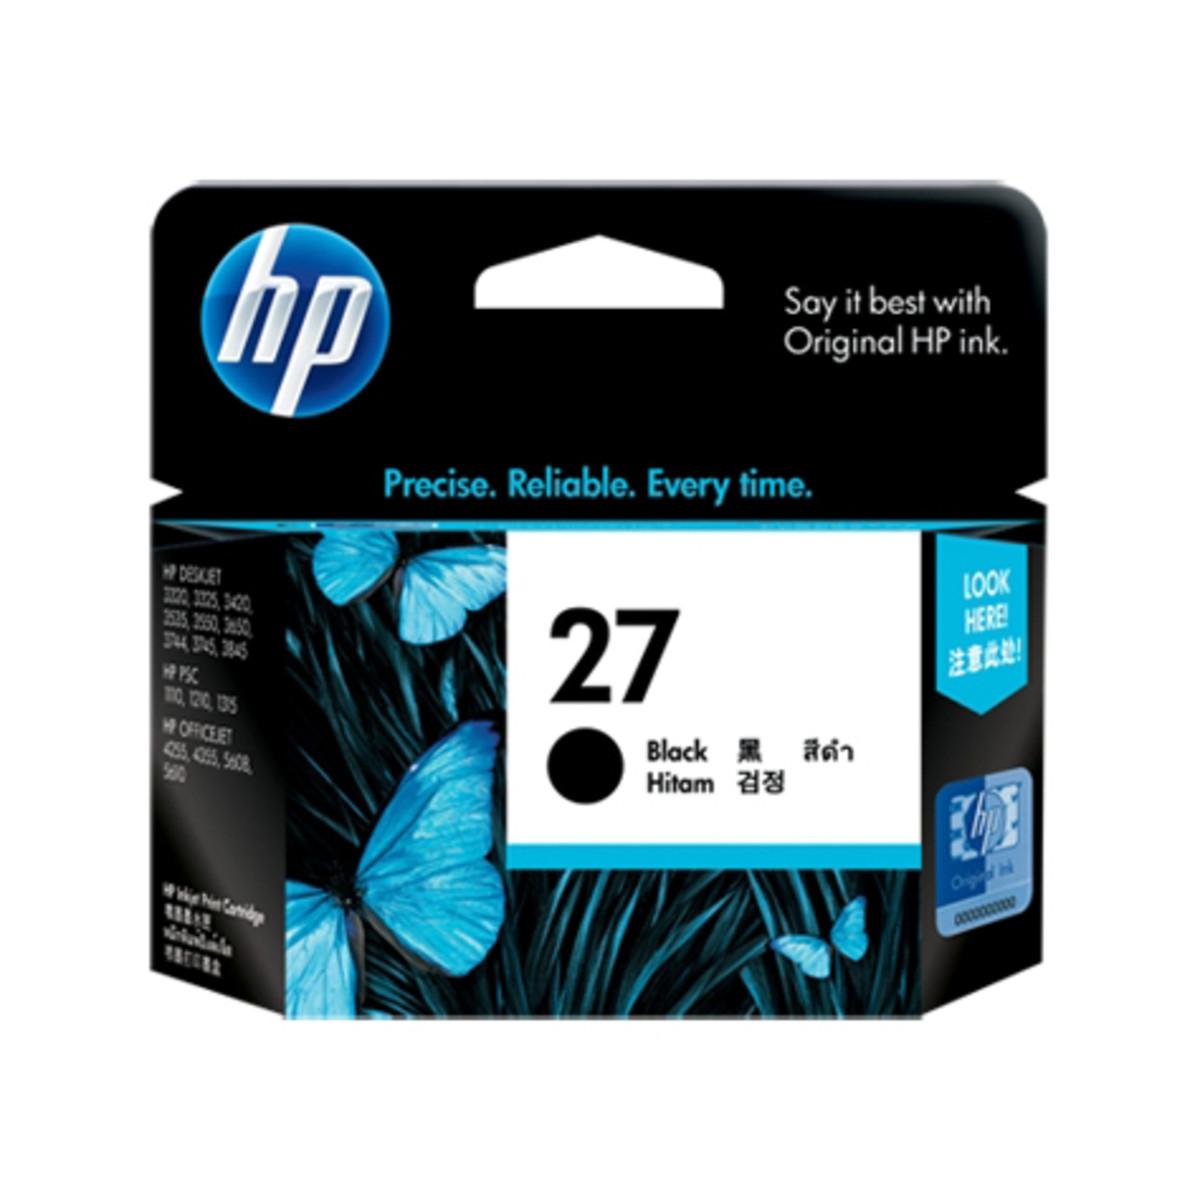 HP 27 (C8727AA) Black Ink Cartridge